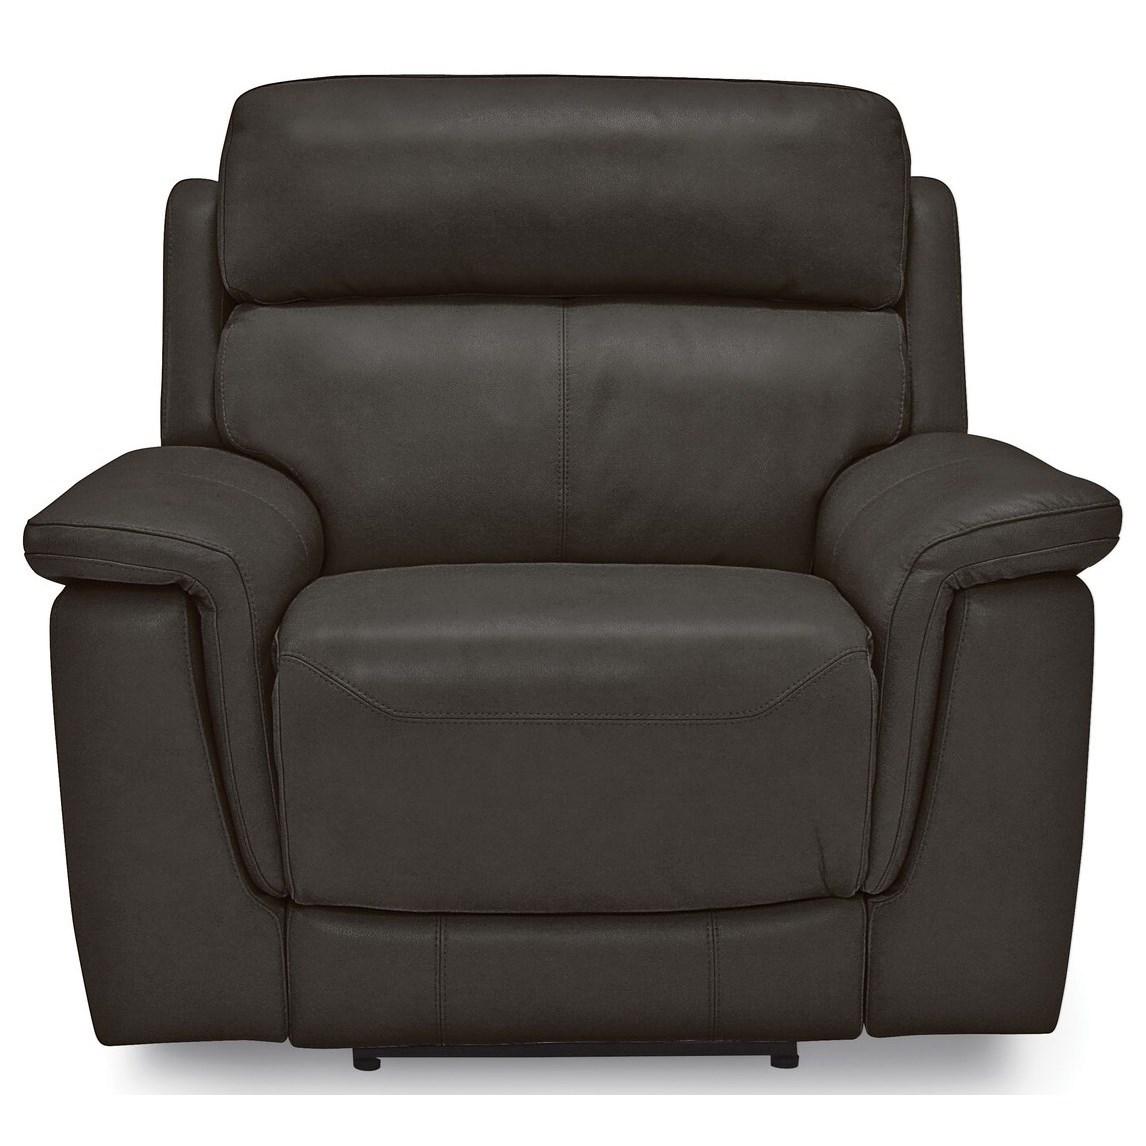 Granada Wallhugger Recliner Chair by Palliser at Darvin Furniture